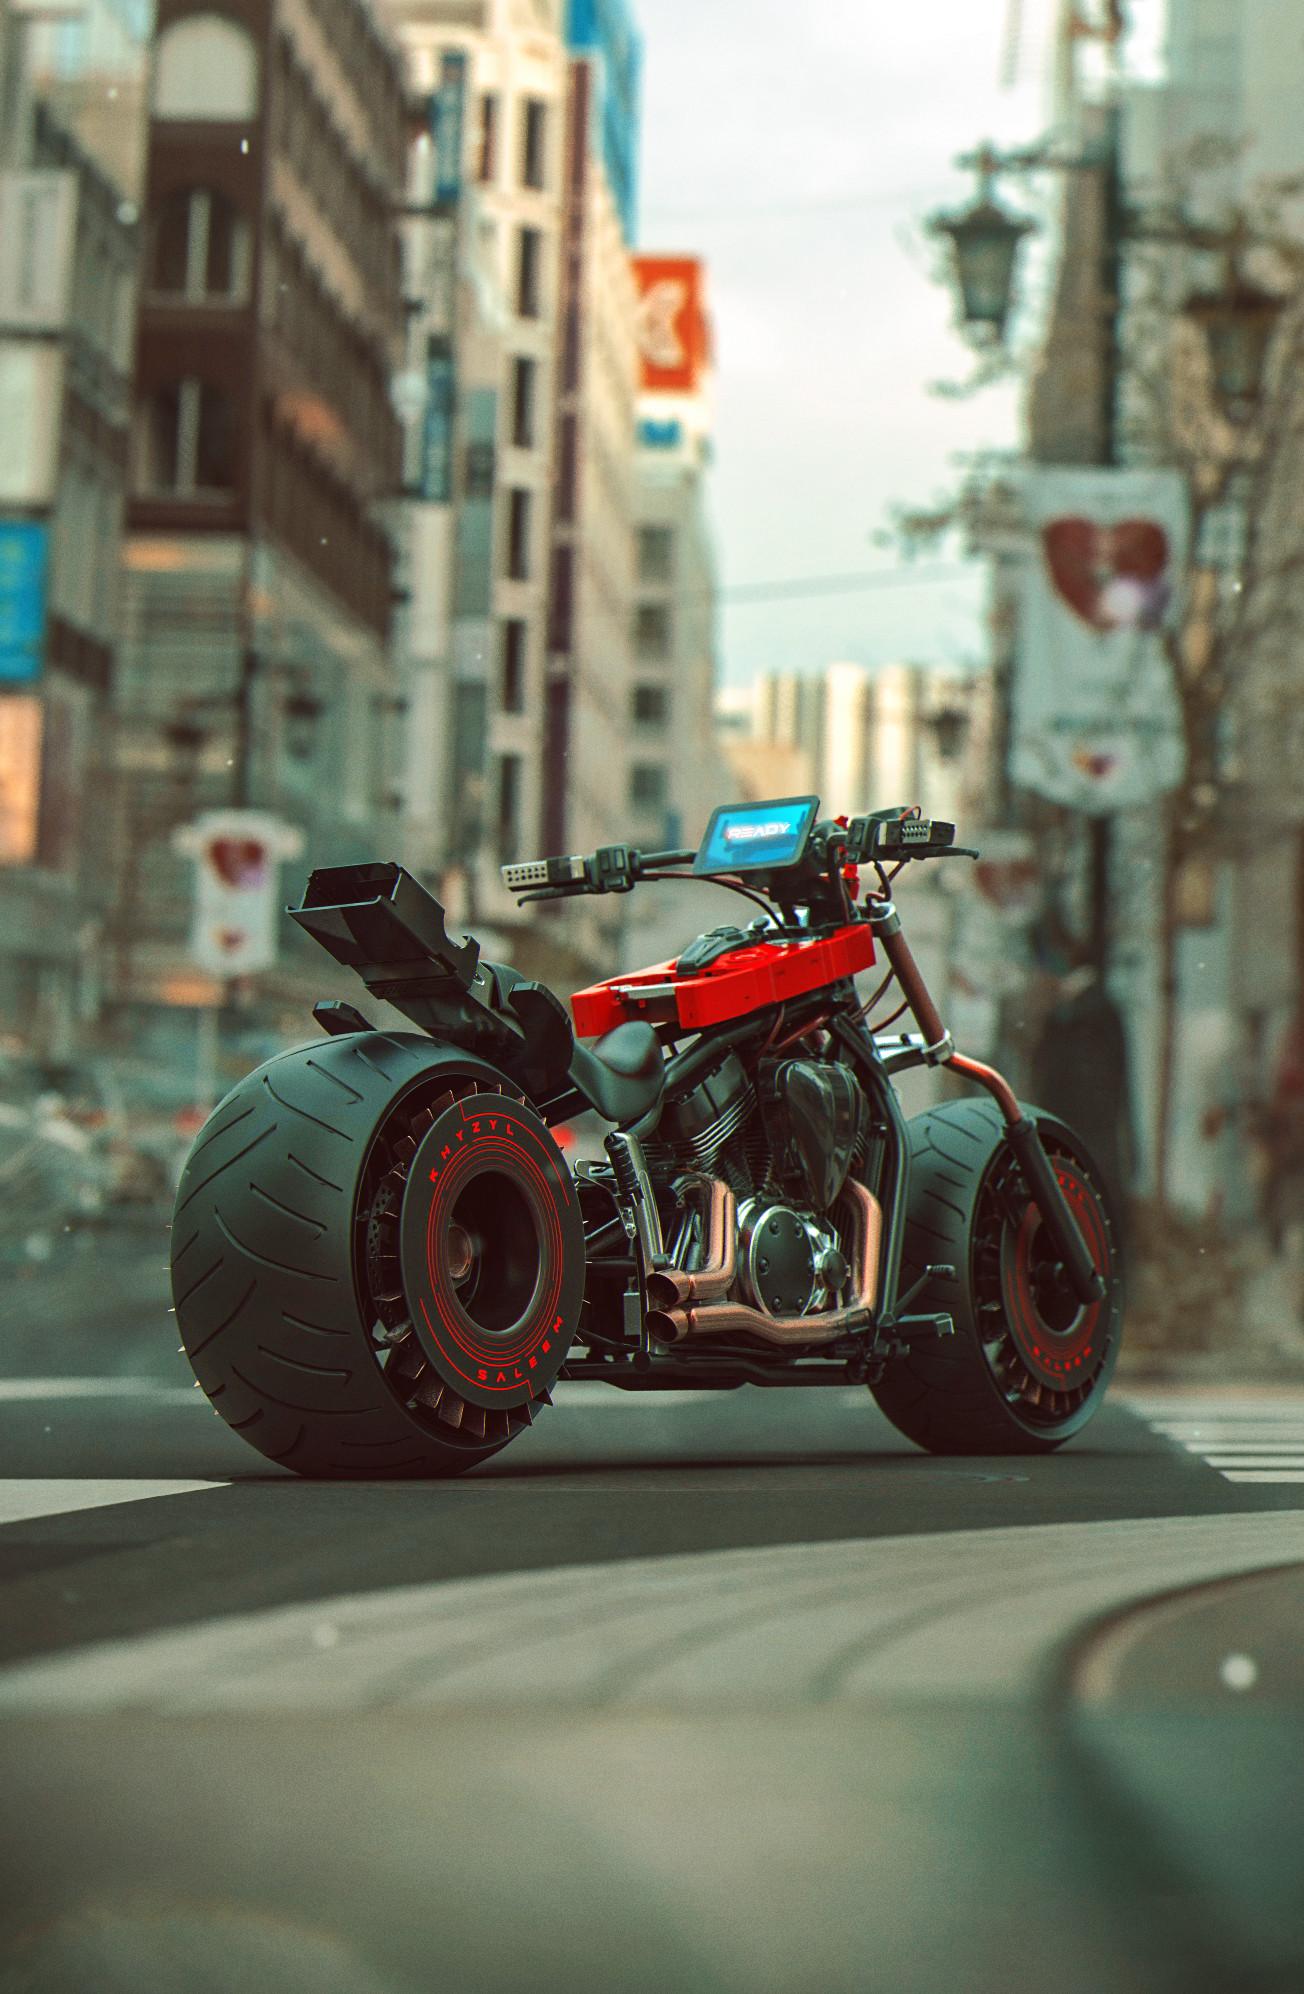 Quelle: Artstation - Khyzyl Saleem - bike-dronefinal2